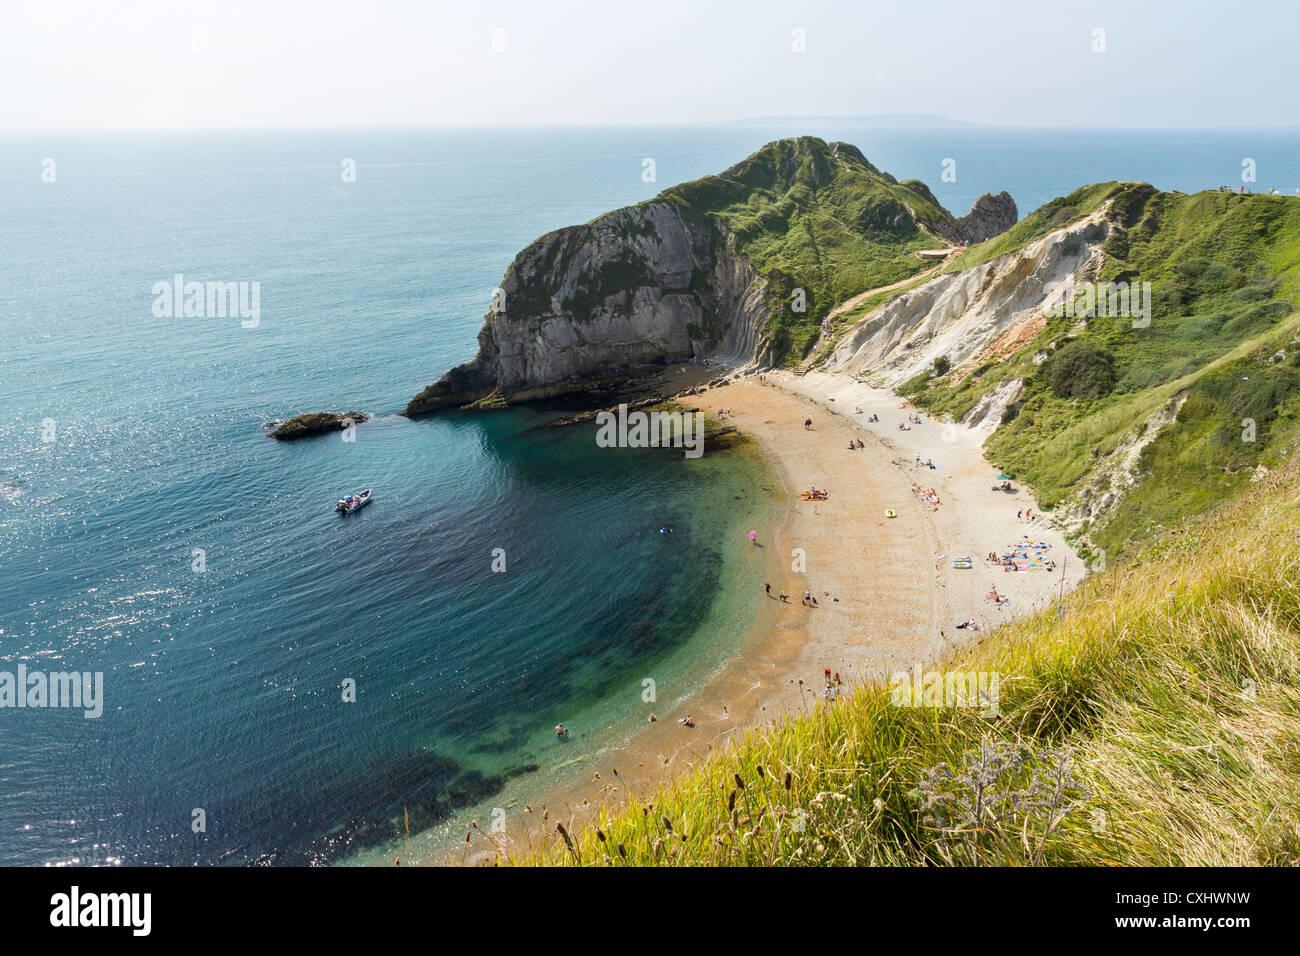 Man o War Bay near Durdle Door Dorset England UK Stock Photo